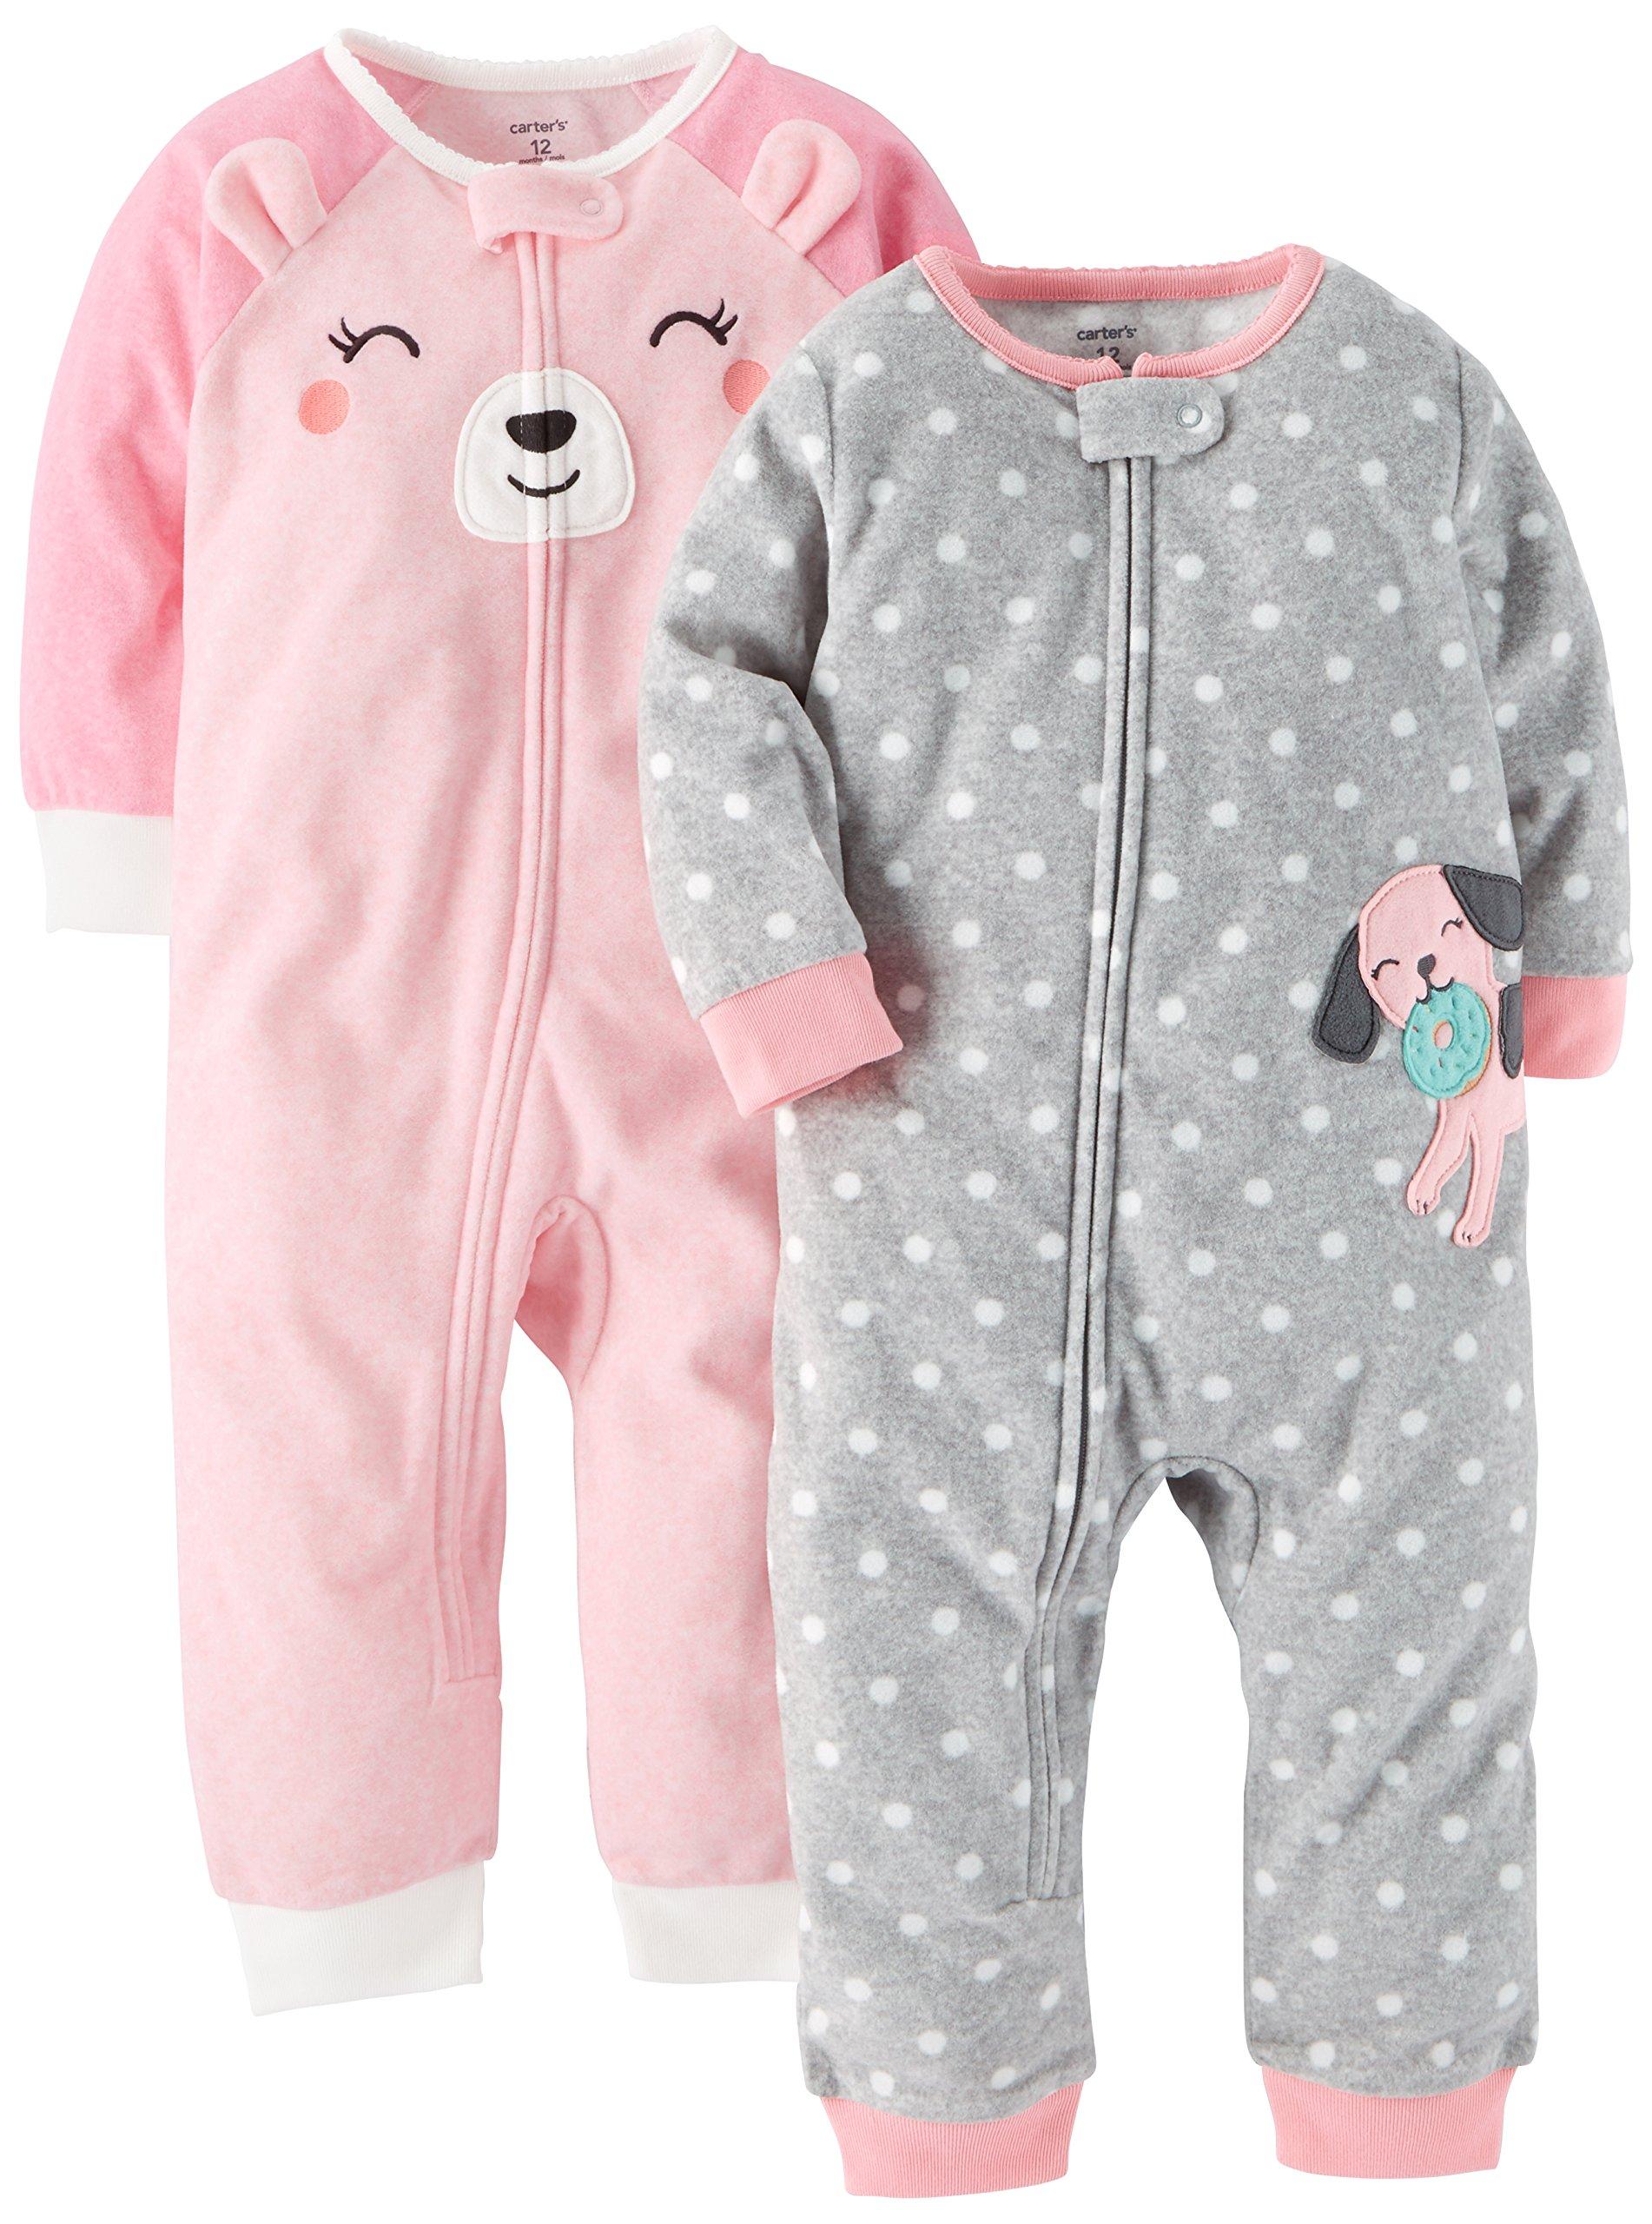 8fe142f2f Carter s Baby Girls  Toddler 2-Pack Fleece Footless Pajamas